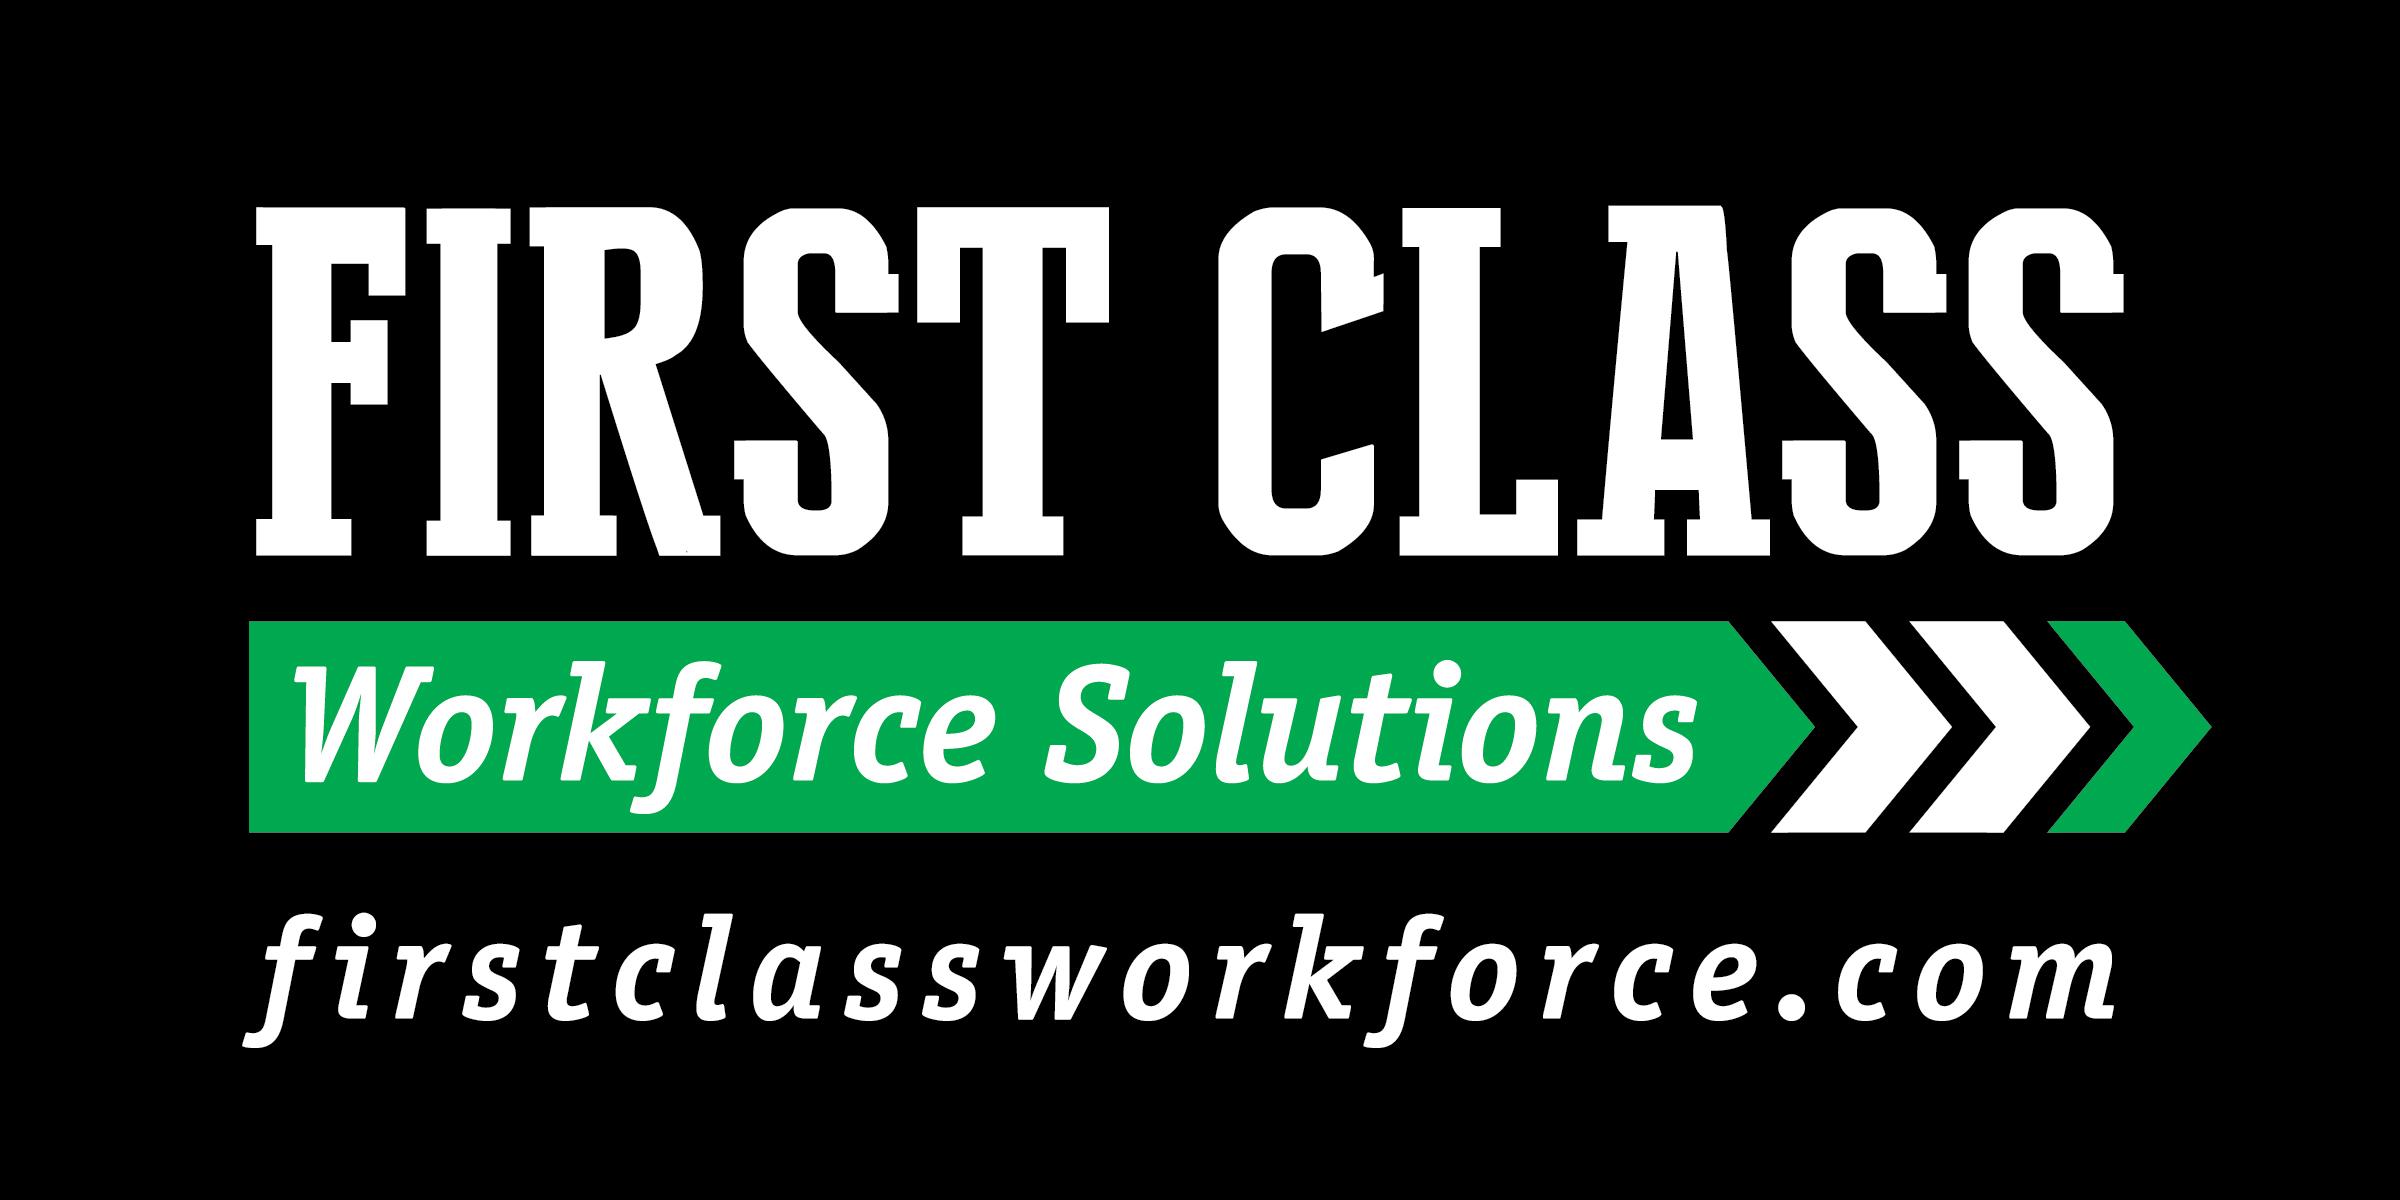 First Class Workforce Solutions